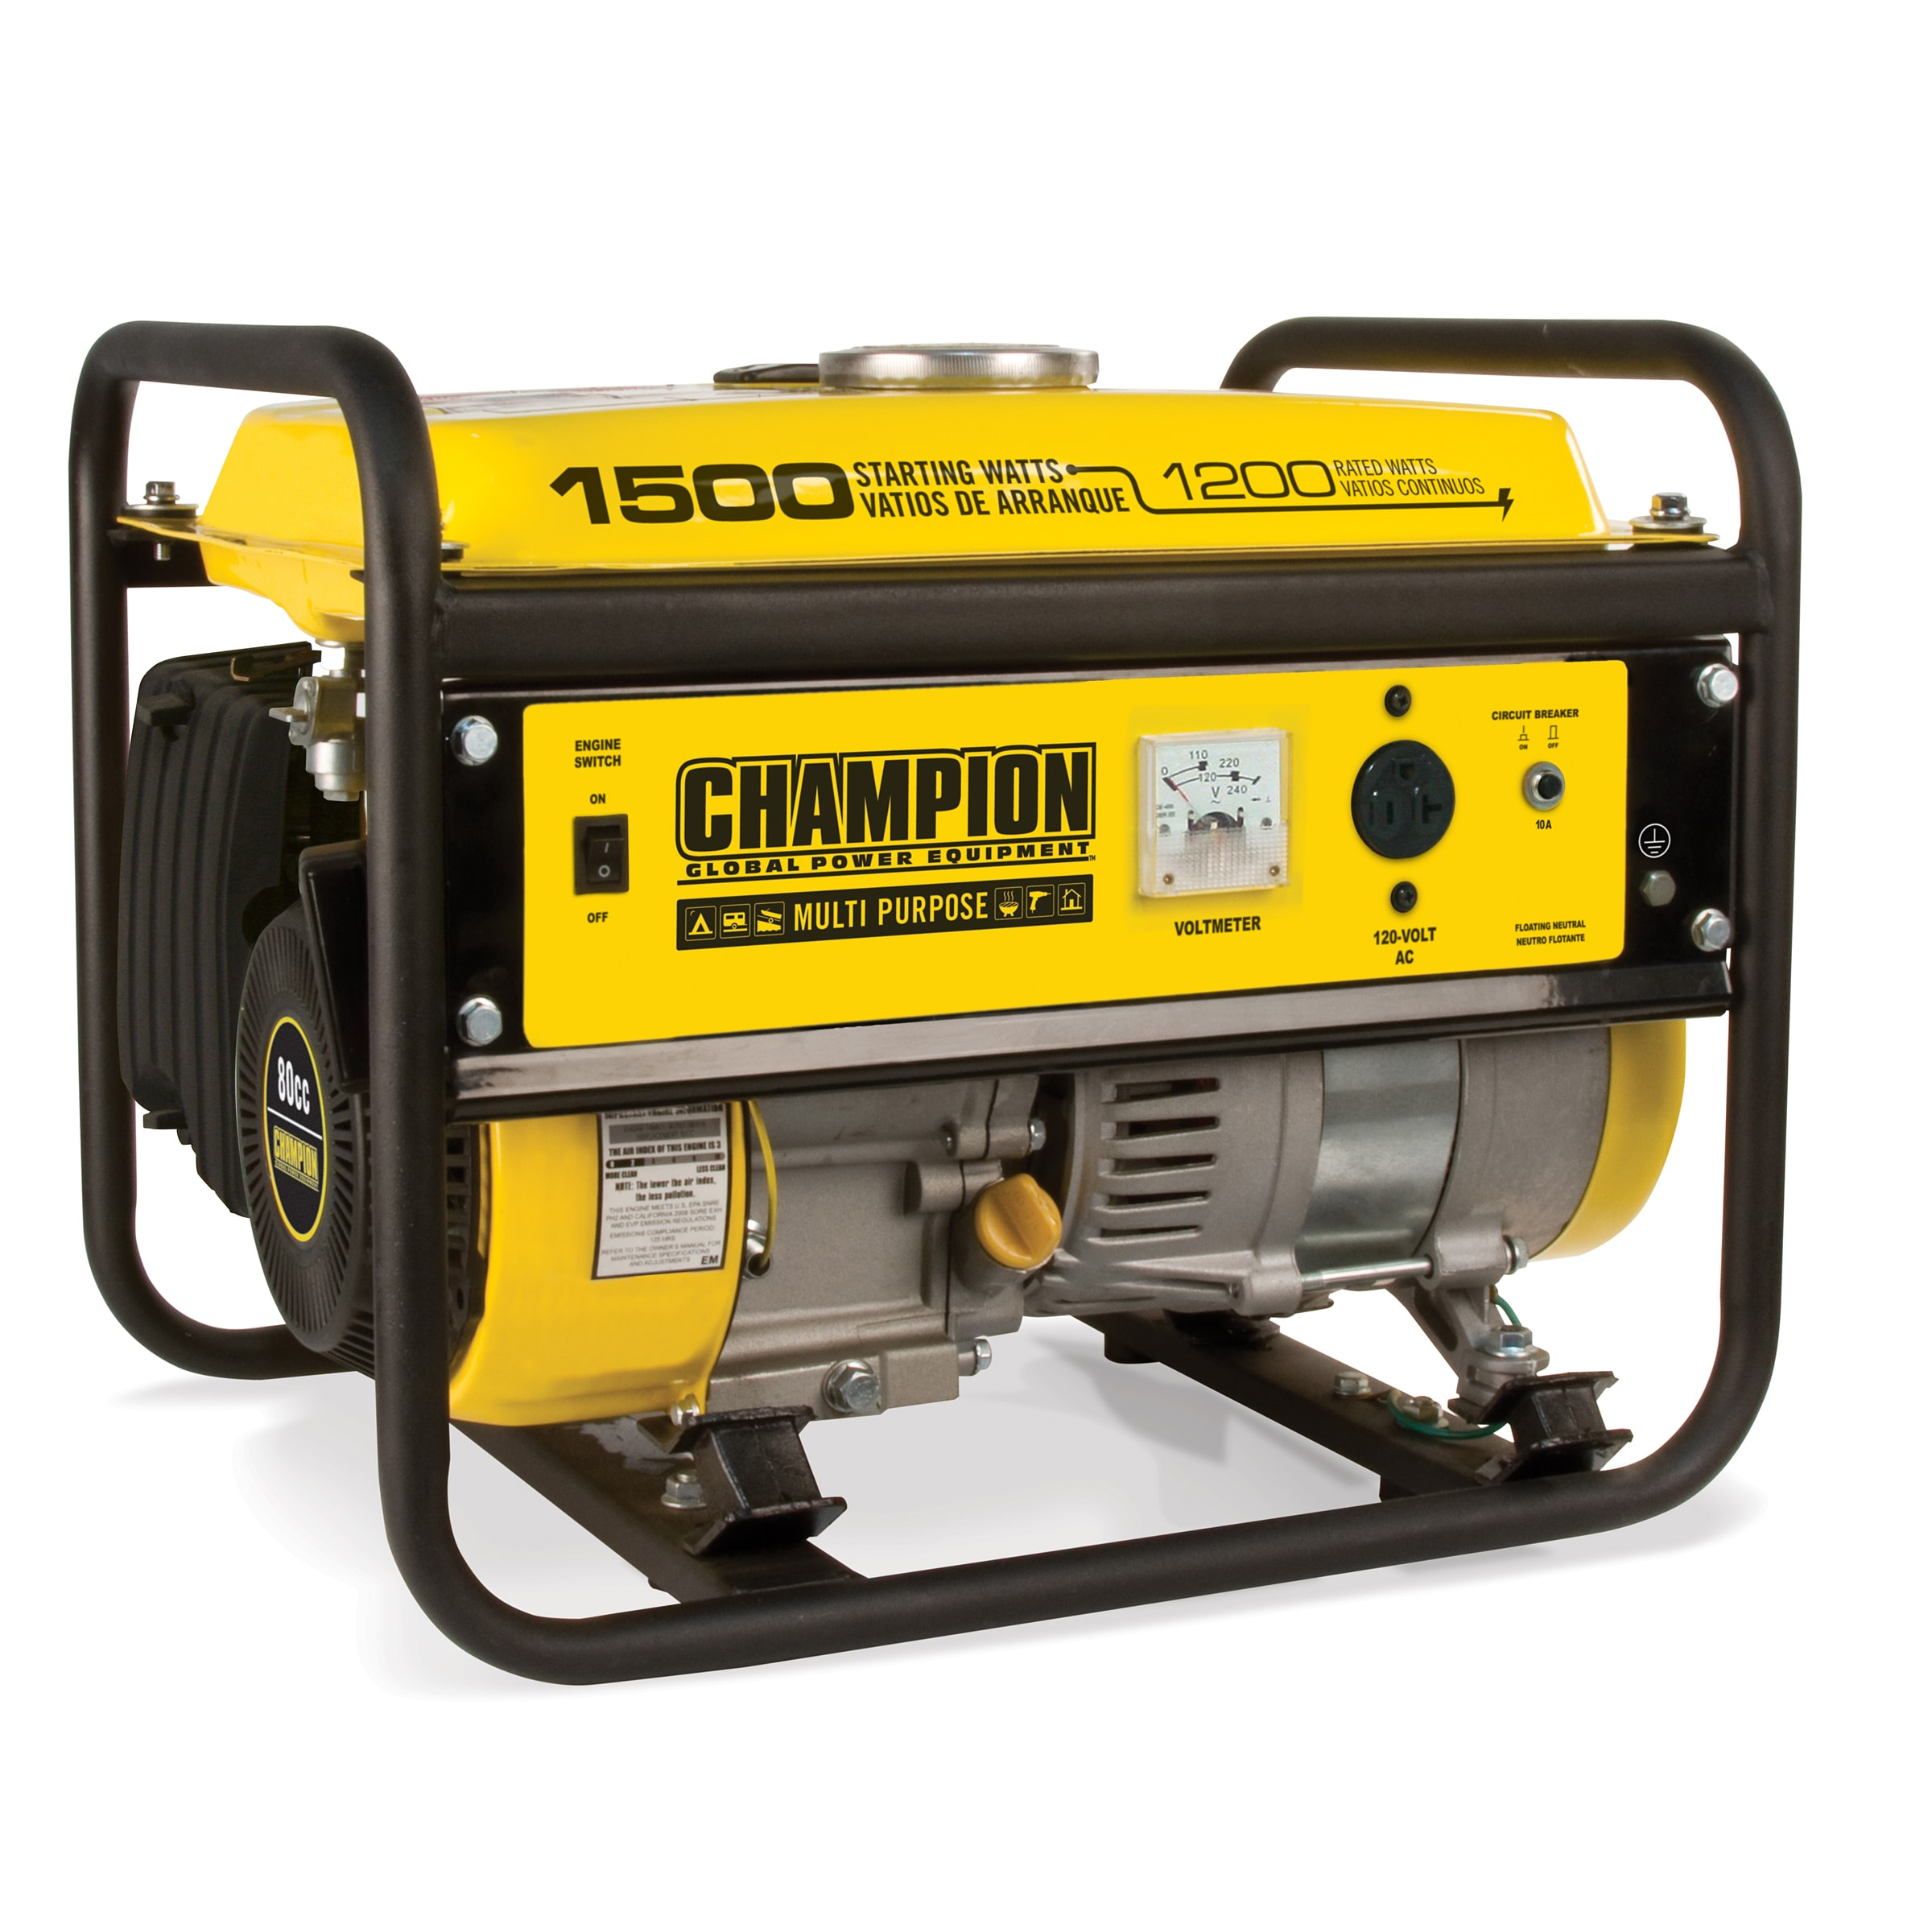 Champion Power Equipment 1200W 1500W 80cc Portable Gas